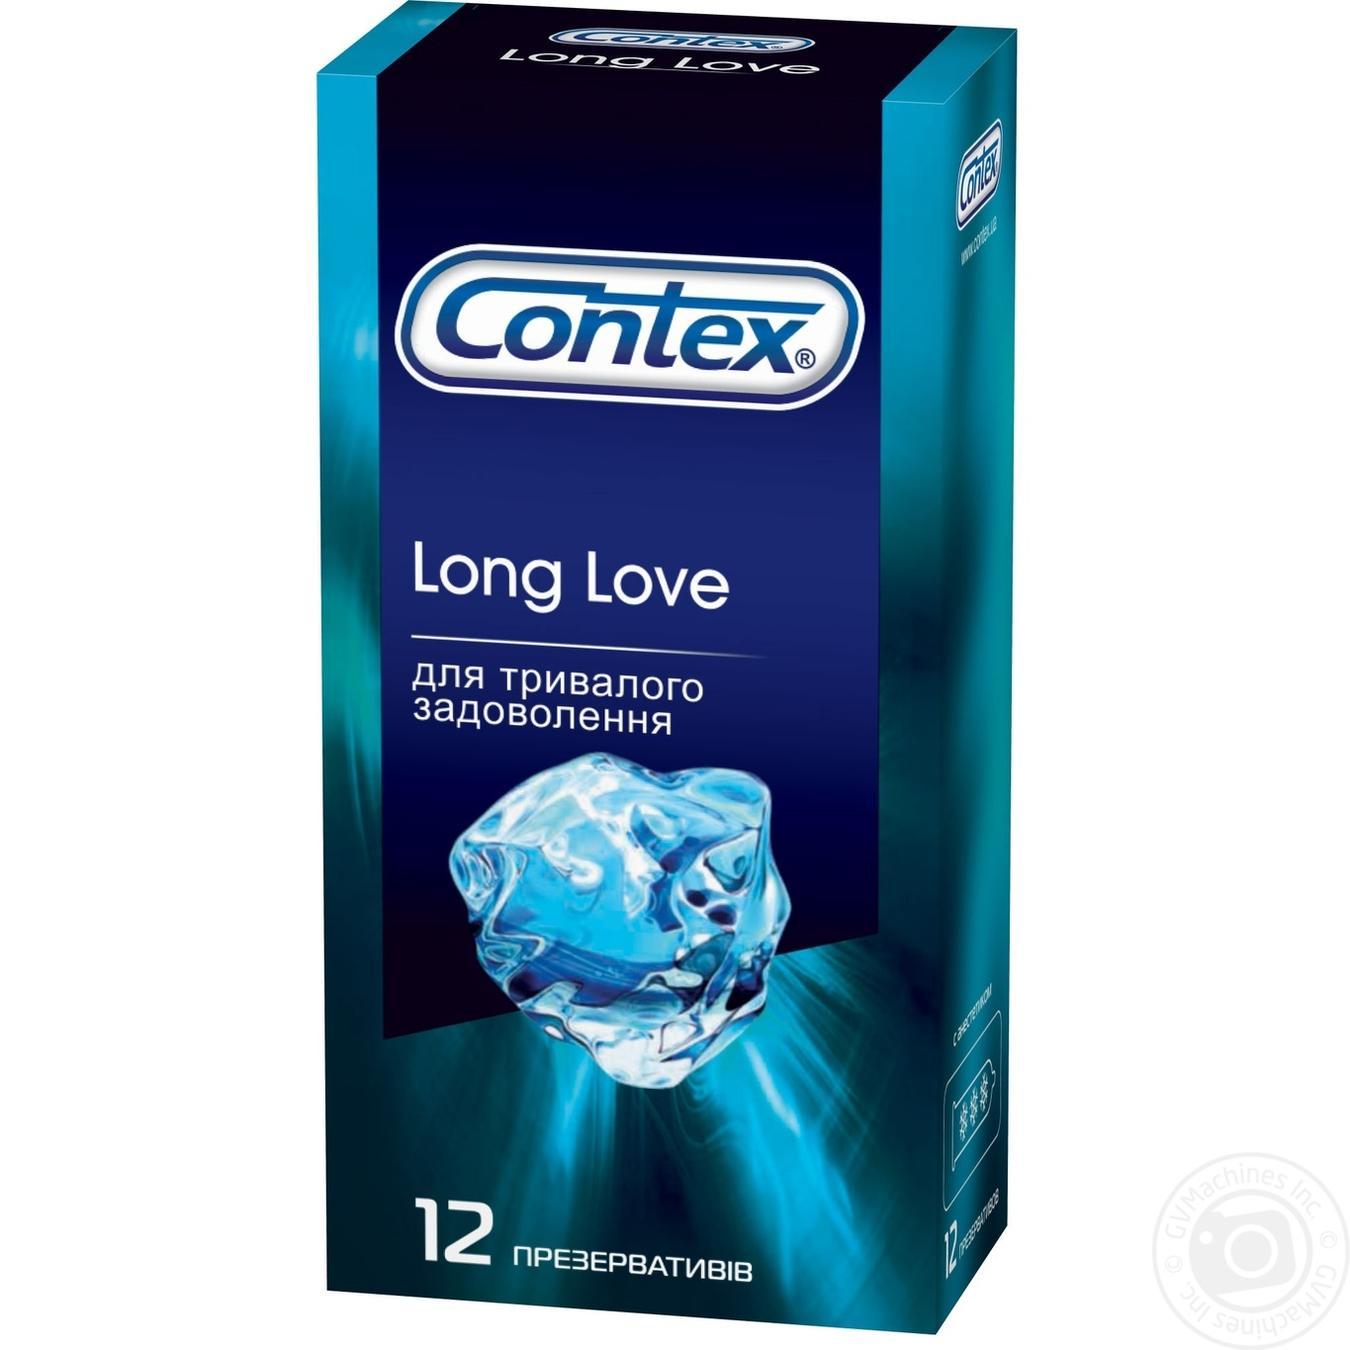 Презервативы Contex Long love 12шт